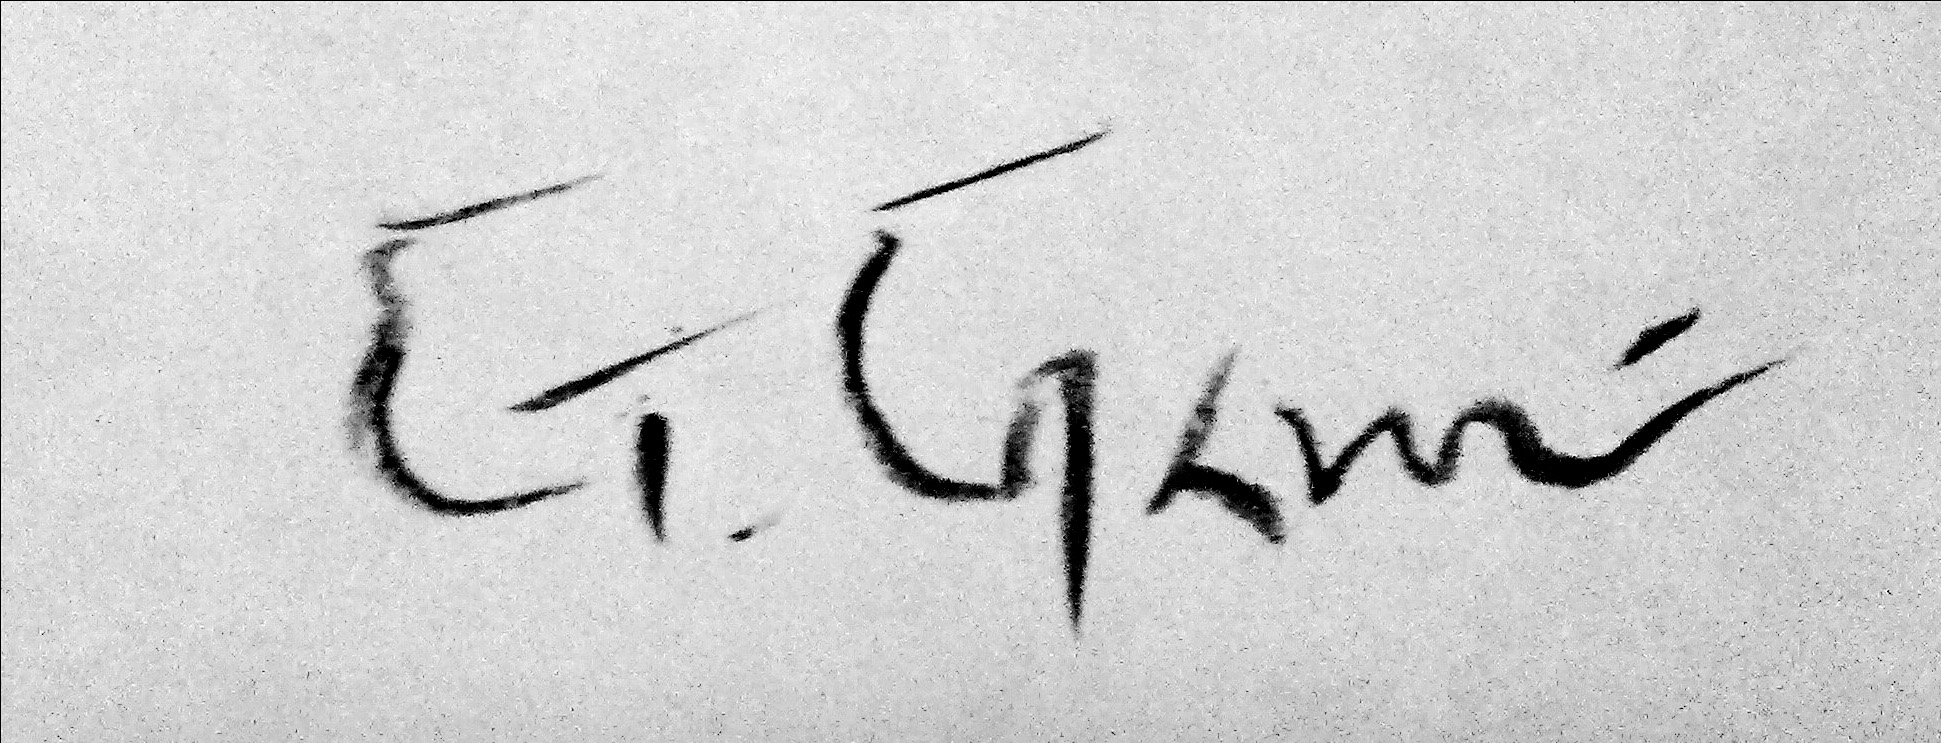 stella spanou Signature